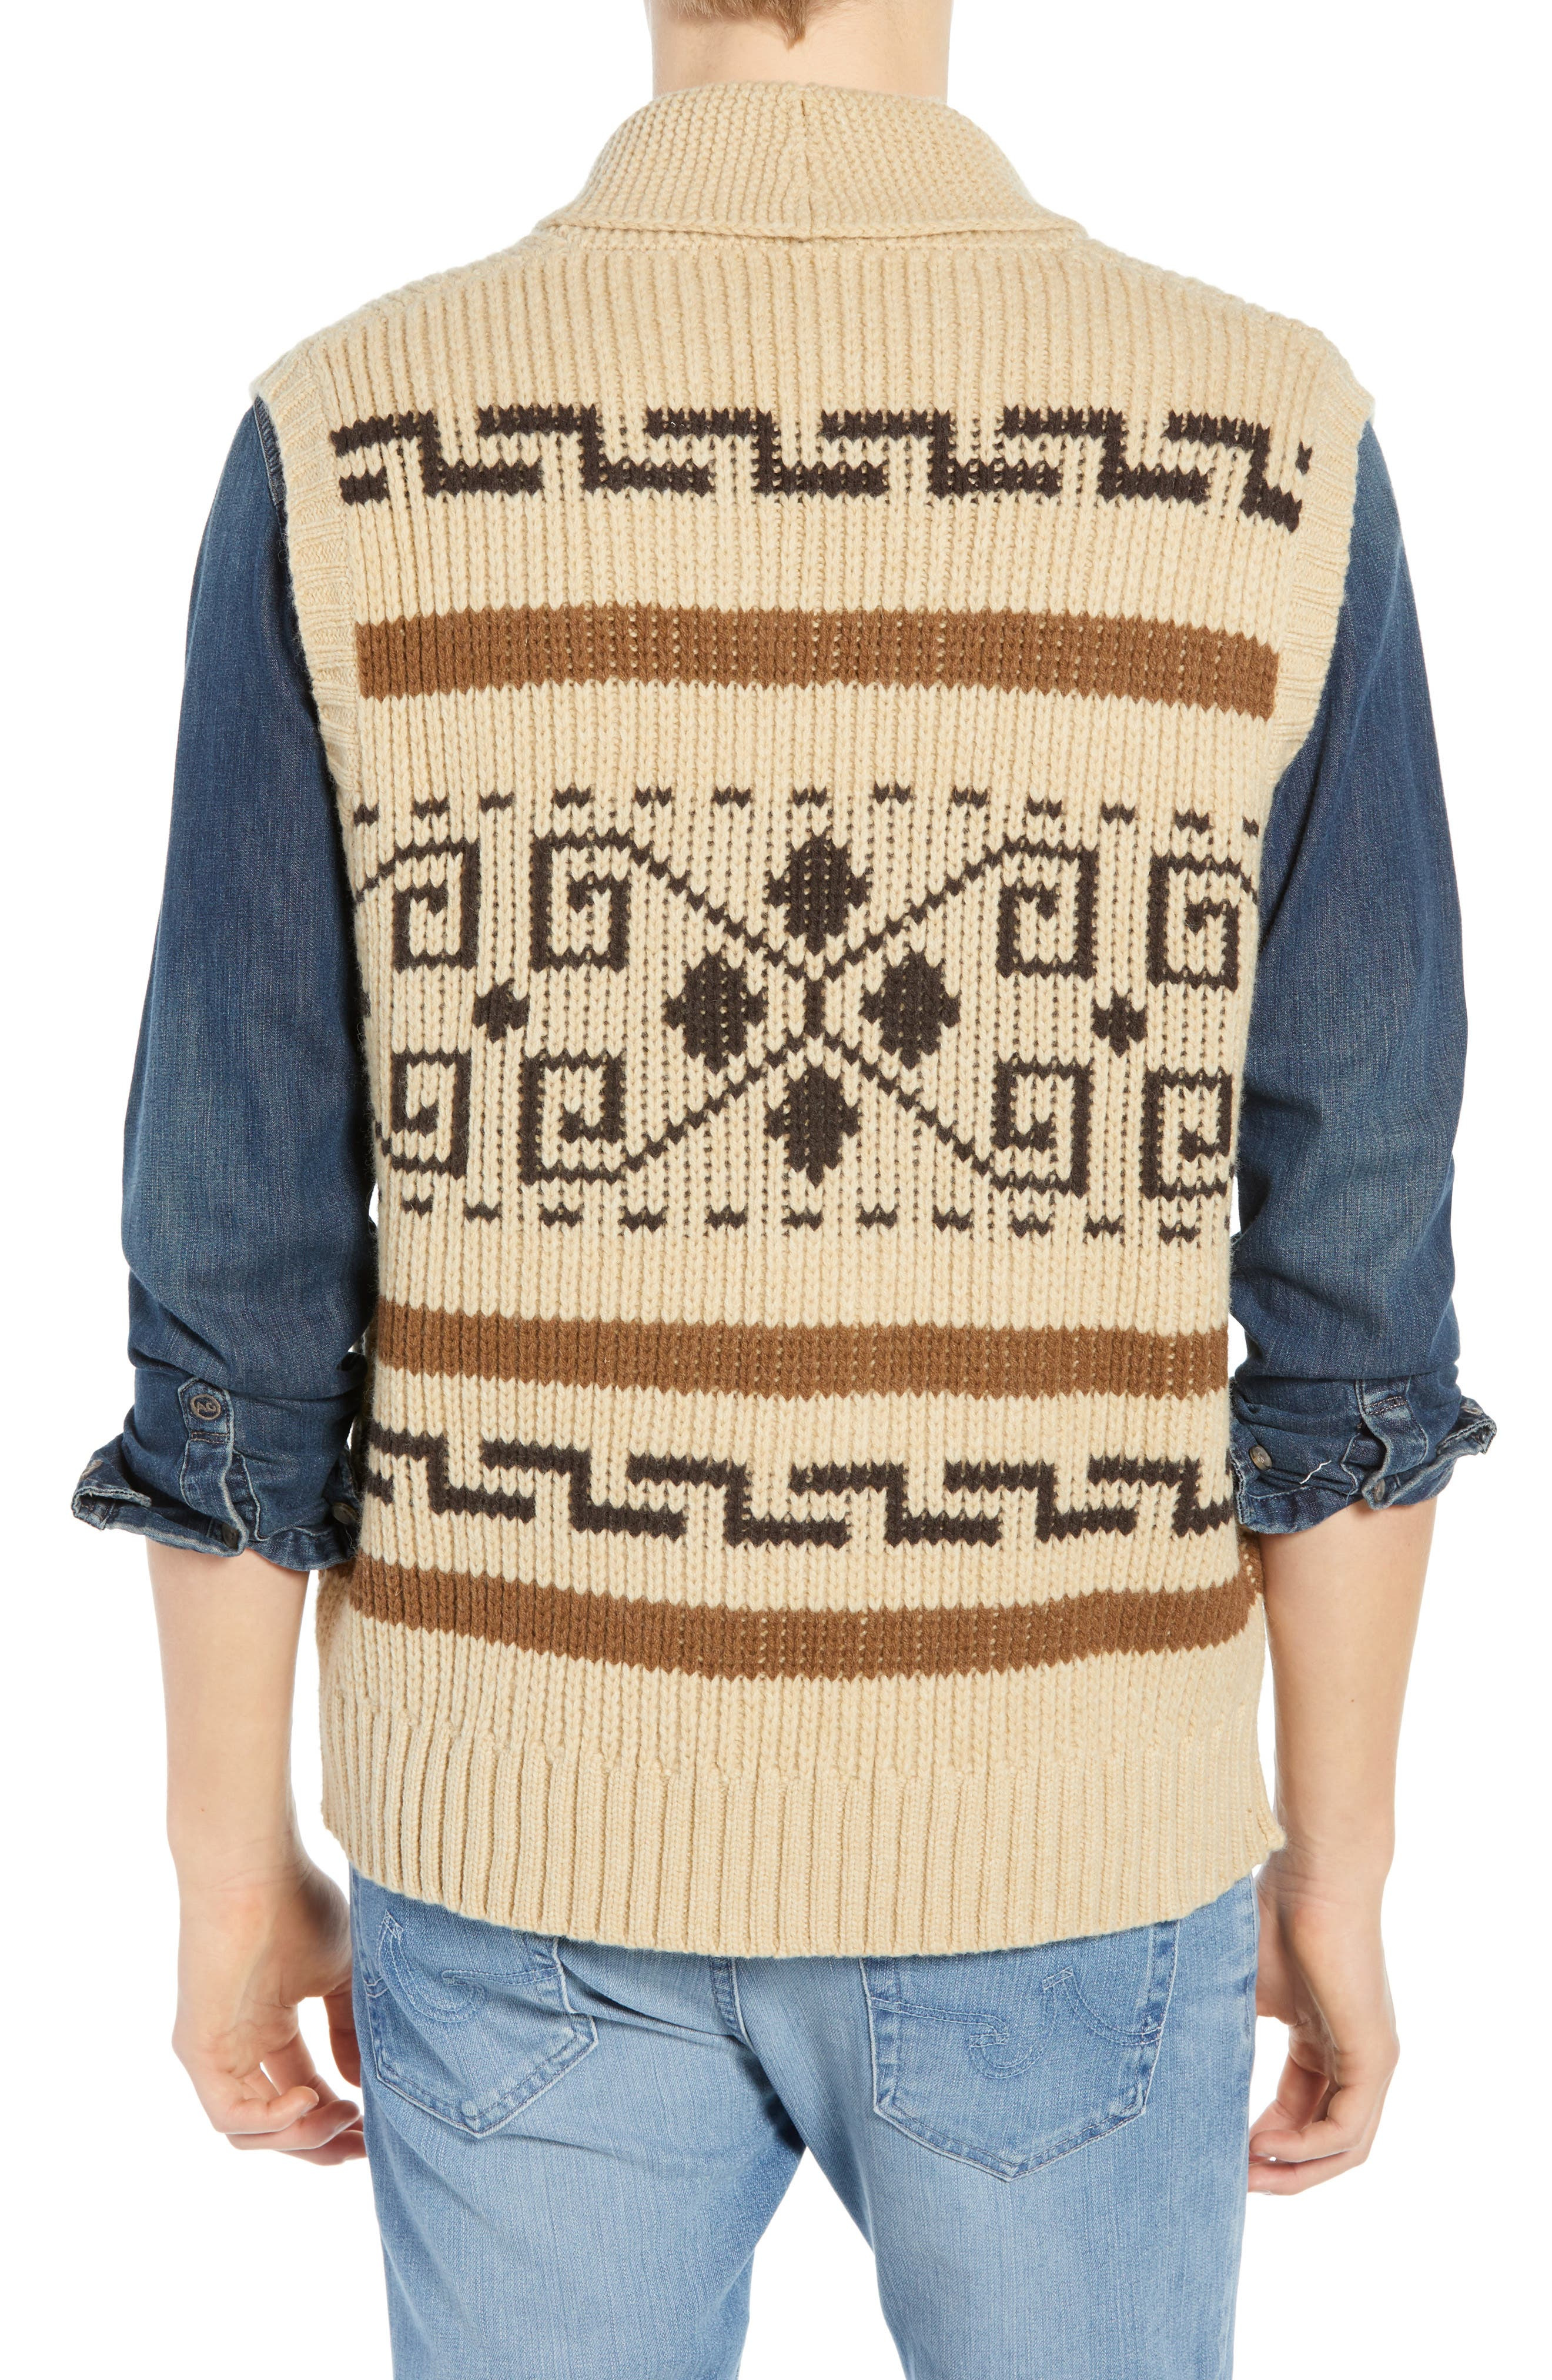 Original Westerley Sweater Vest,                             Alternate thumbnail 2, color,                             TAN/ BROWN